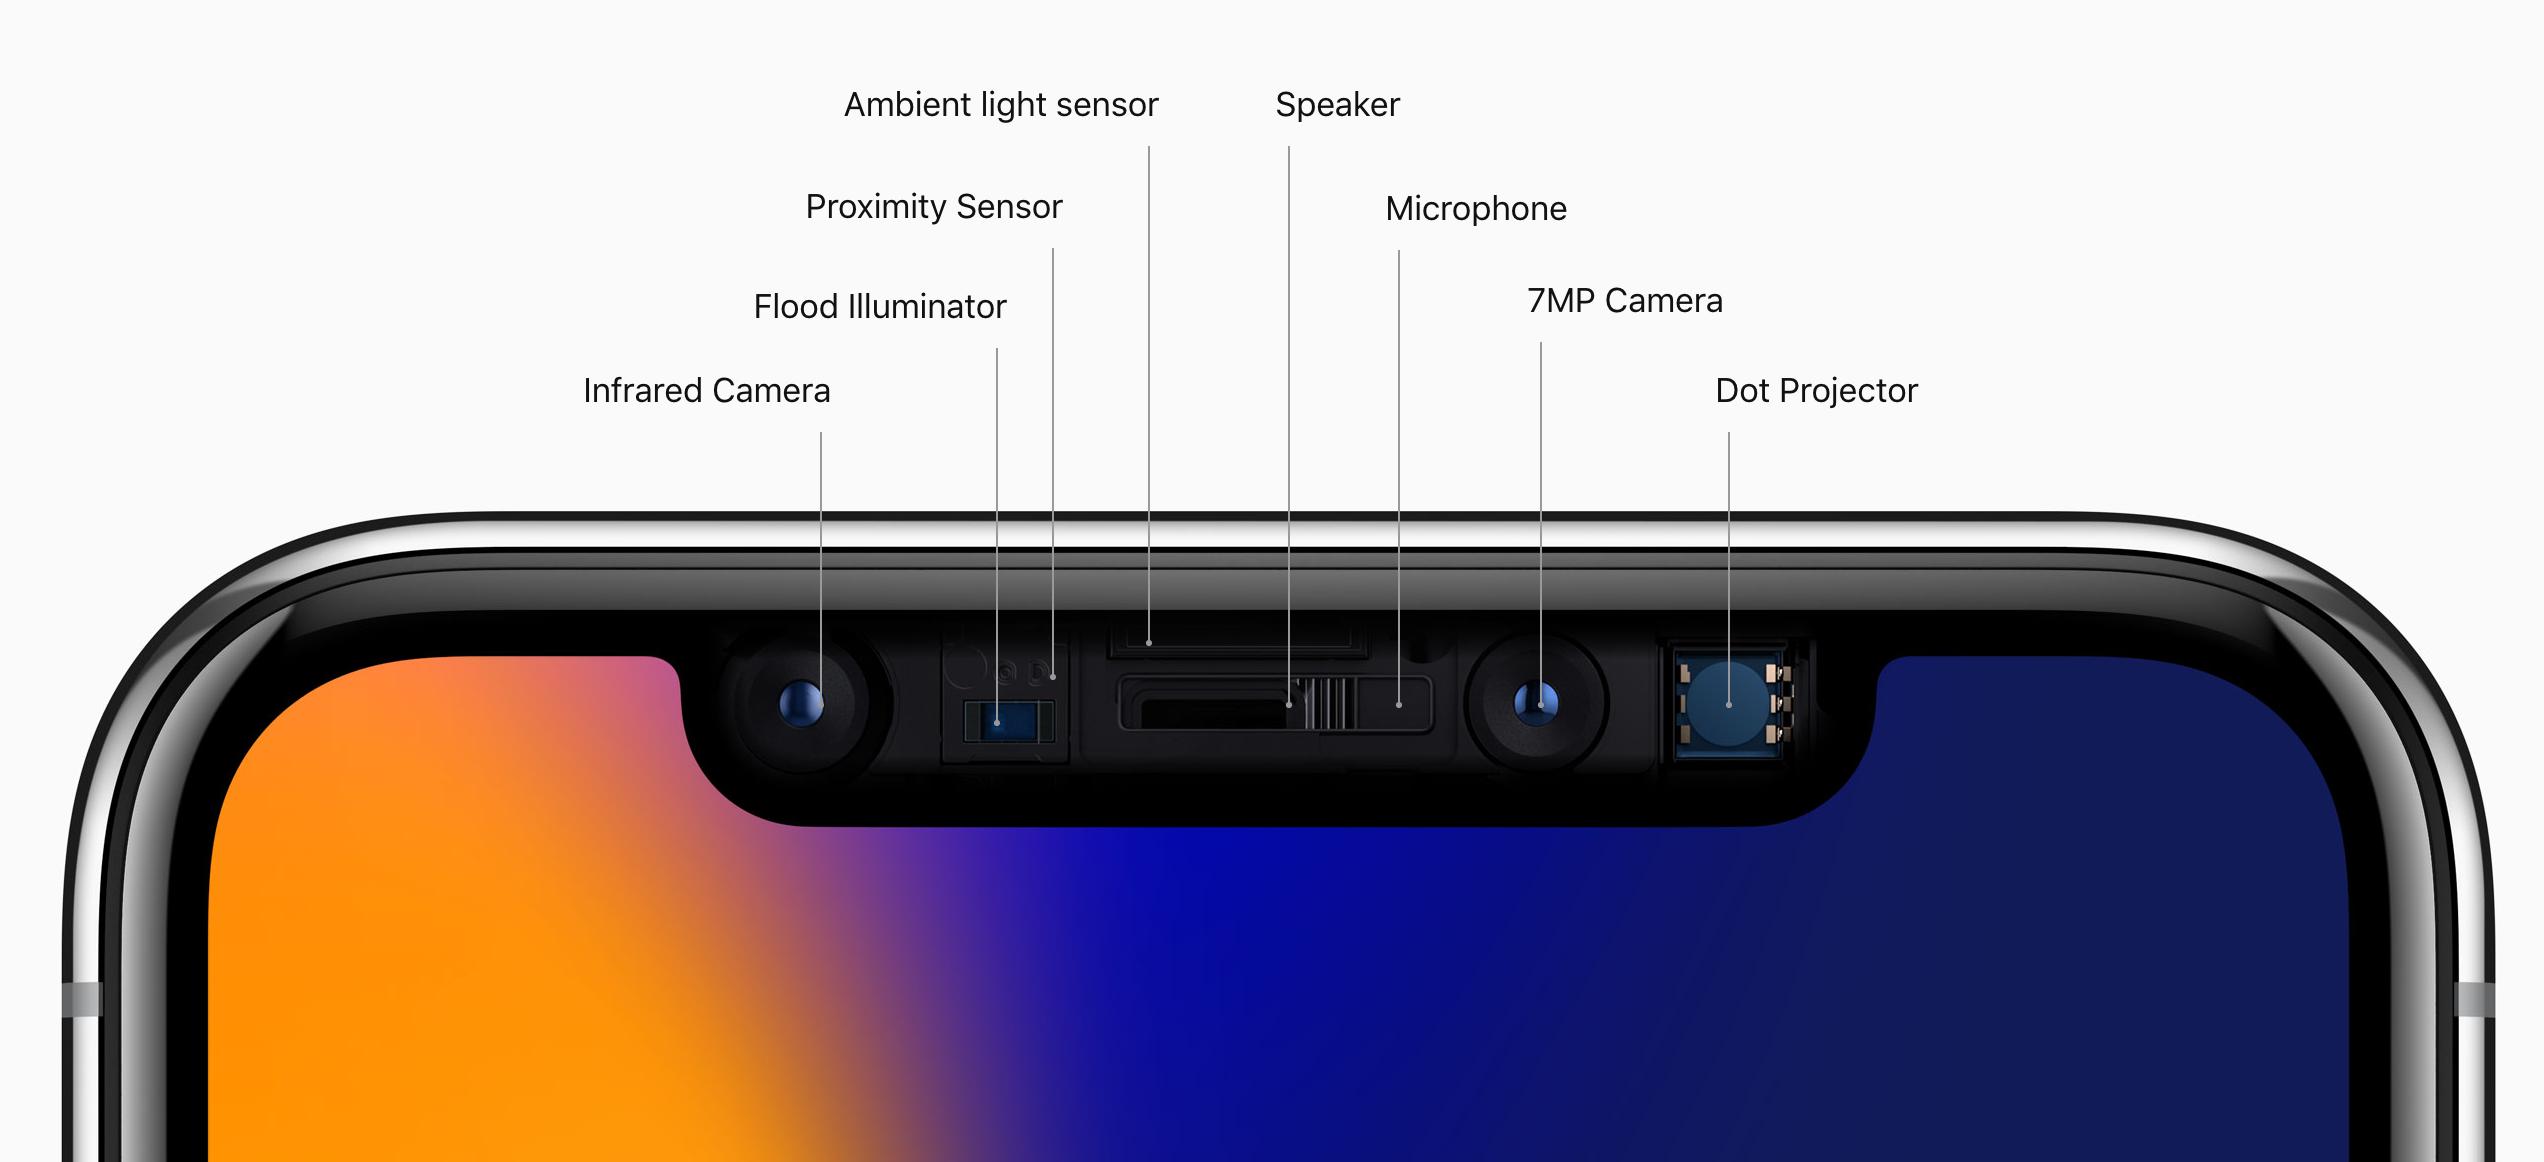 Description of TrueDepth camera components